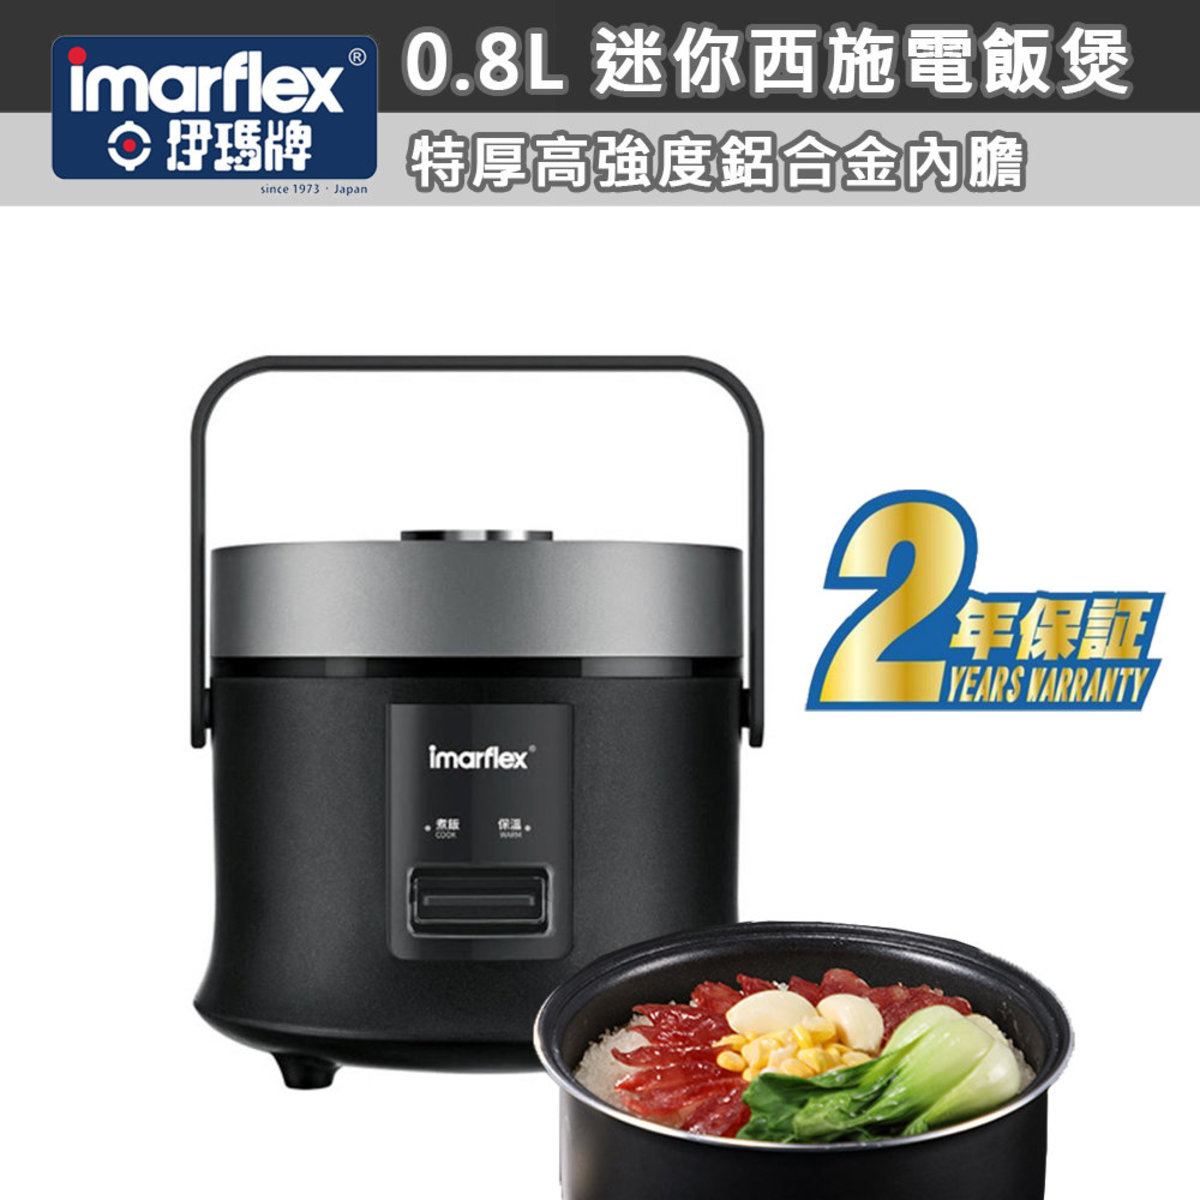 0.8L 迷你西施電飯煲 - IRC-YH16BK